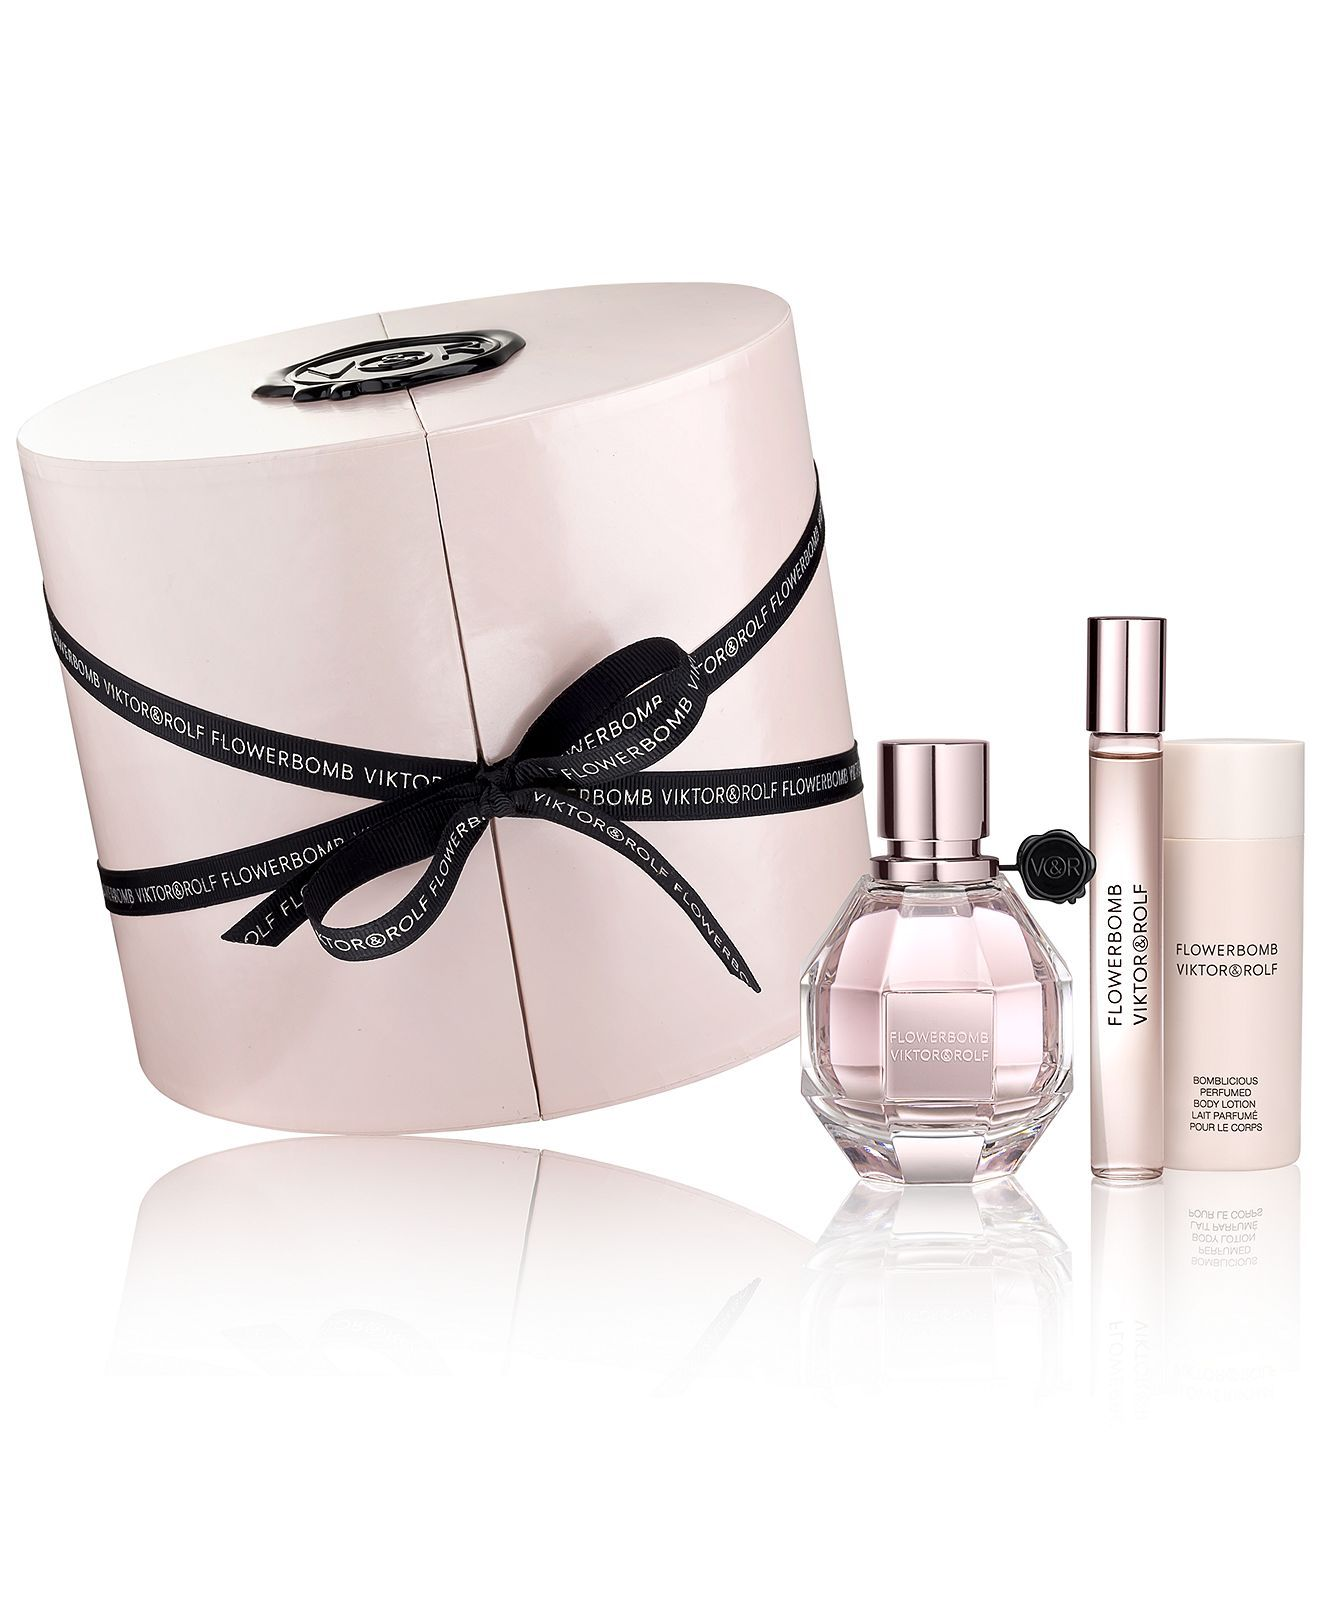 Viktor Rolf Flowerbomb Gift Set Perfume Beauty Macy S Perfume Gift Sets Perfume Gift Beauty Gift Sets